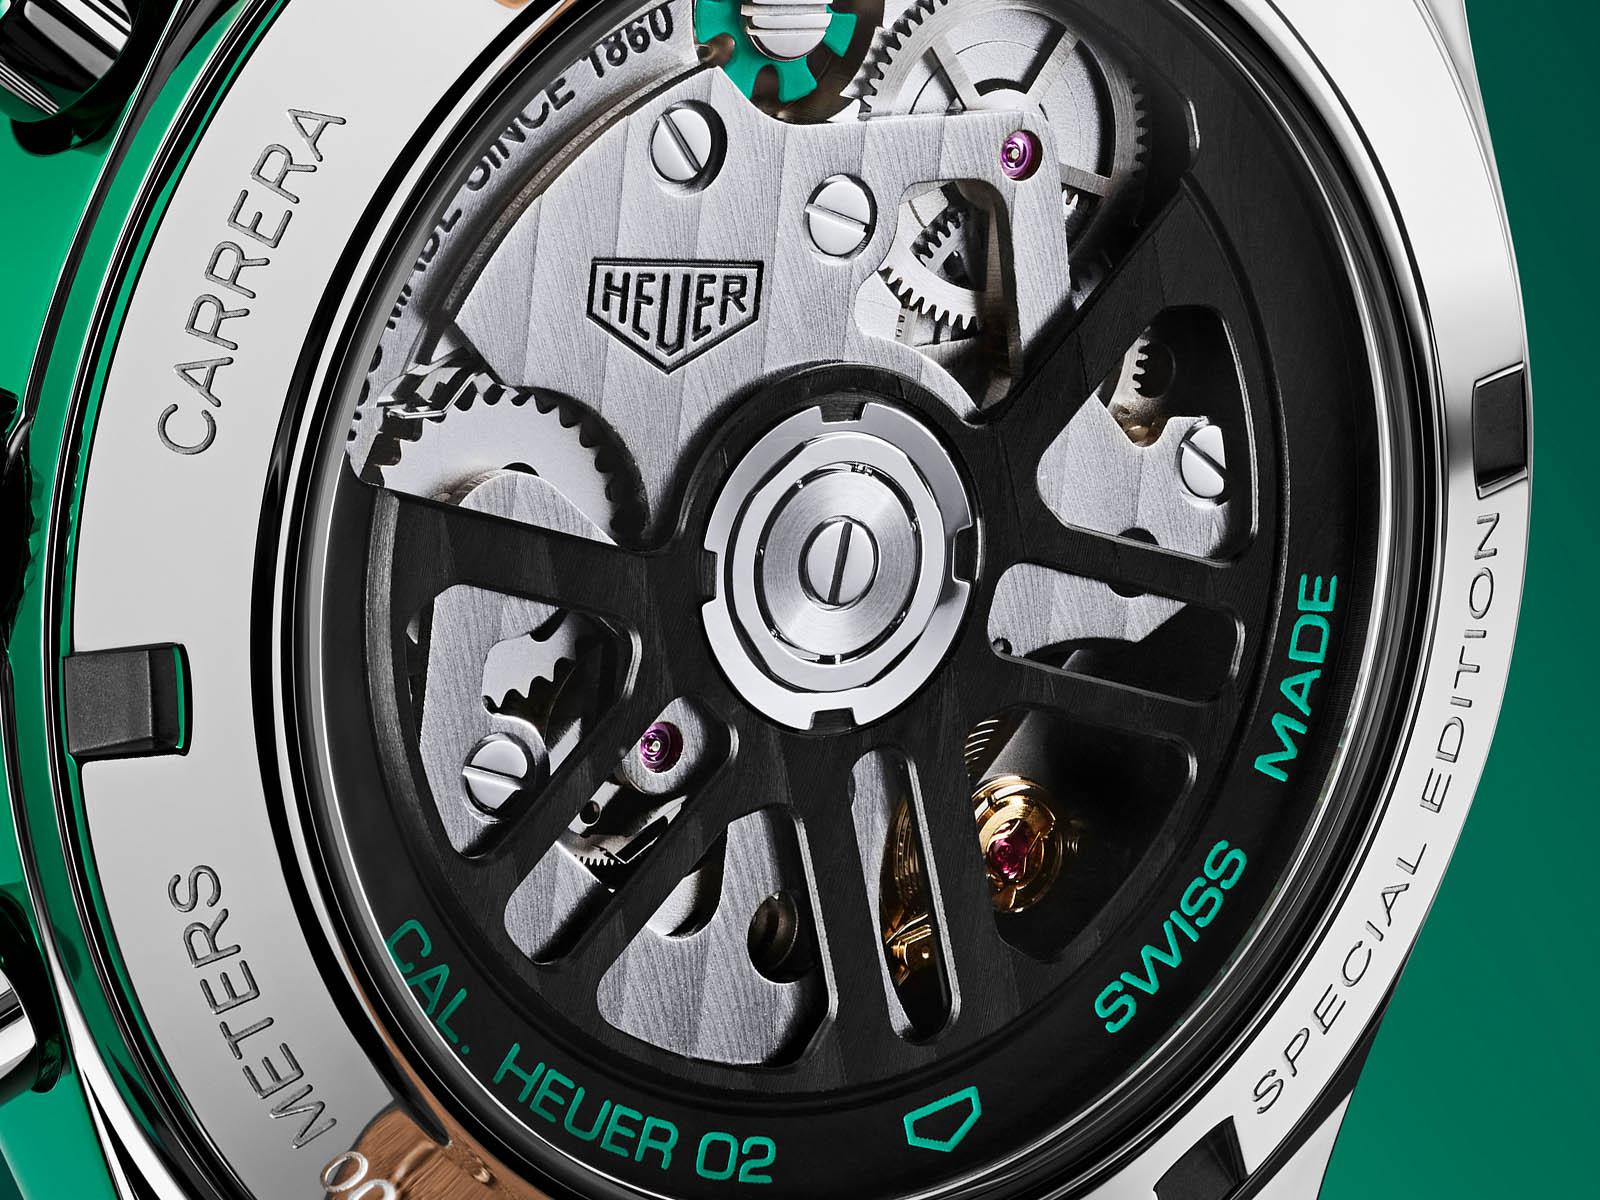 cbk221f-fc6479-tag-heuer-carrera-green-special-edition-6.jpg